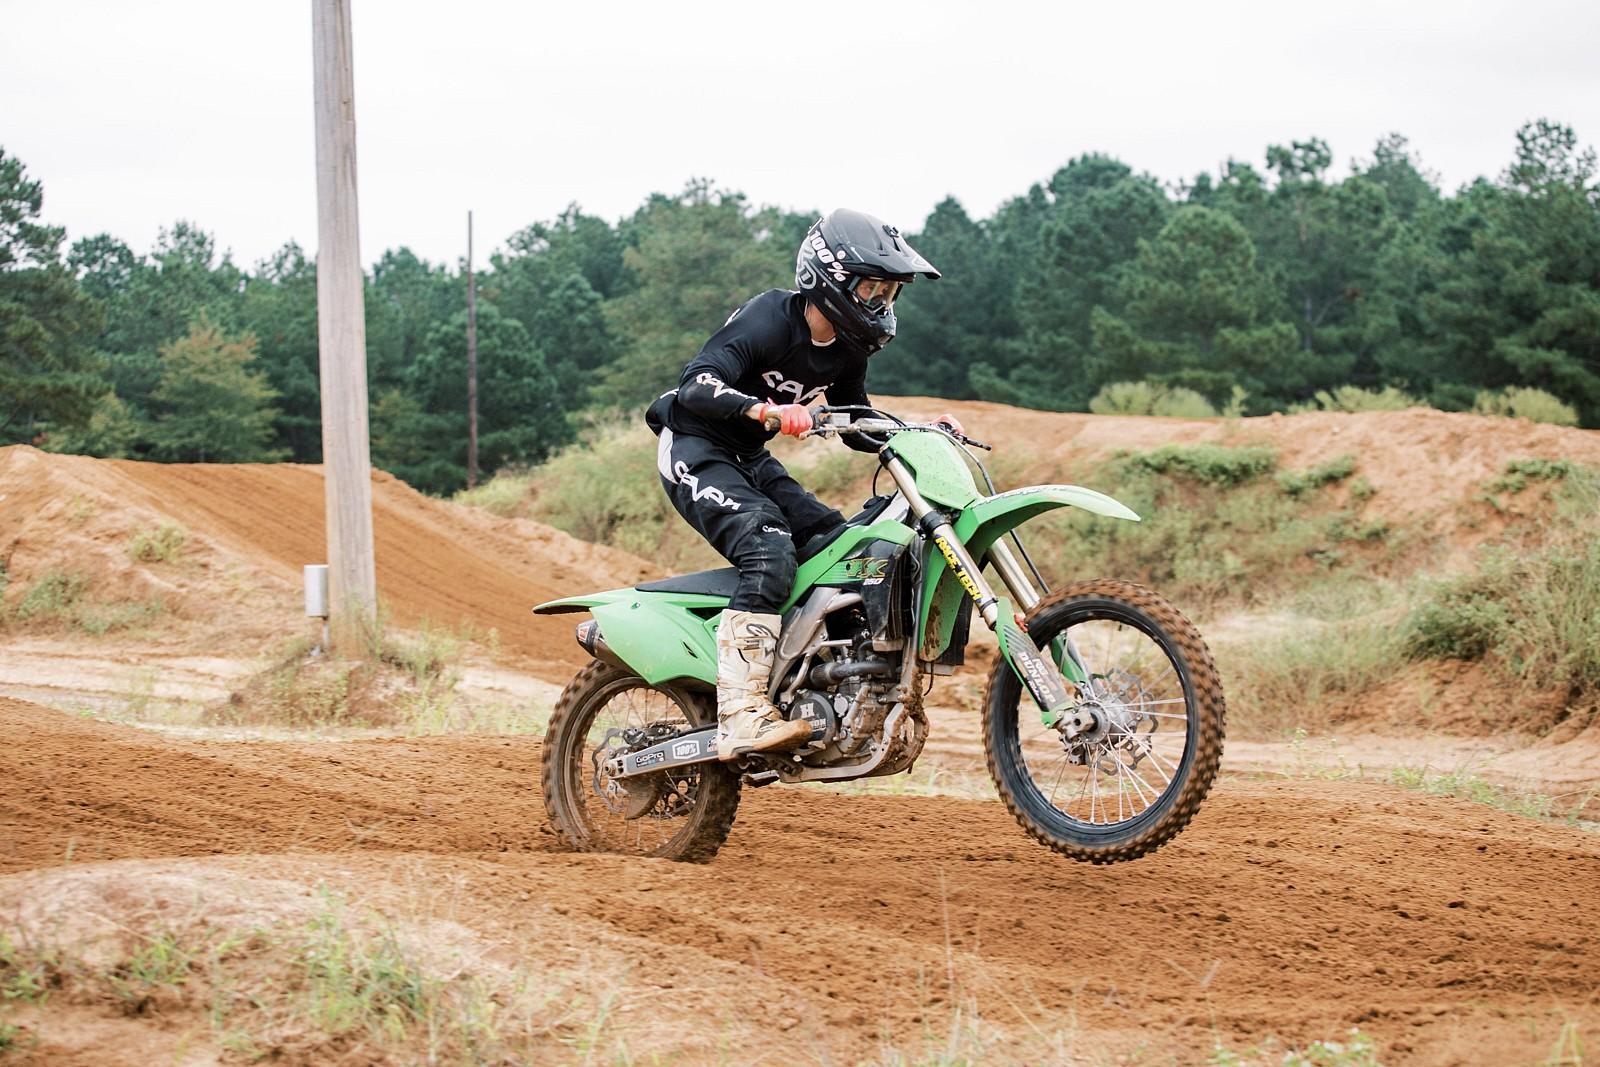 C26FF755-36F3-4894-BF62-CB618A36F169 - Reid Waddell - Motocross Pictures - Vital MX